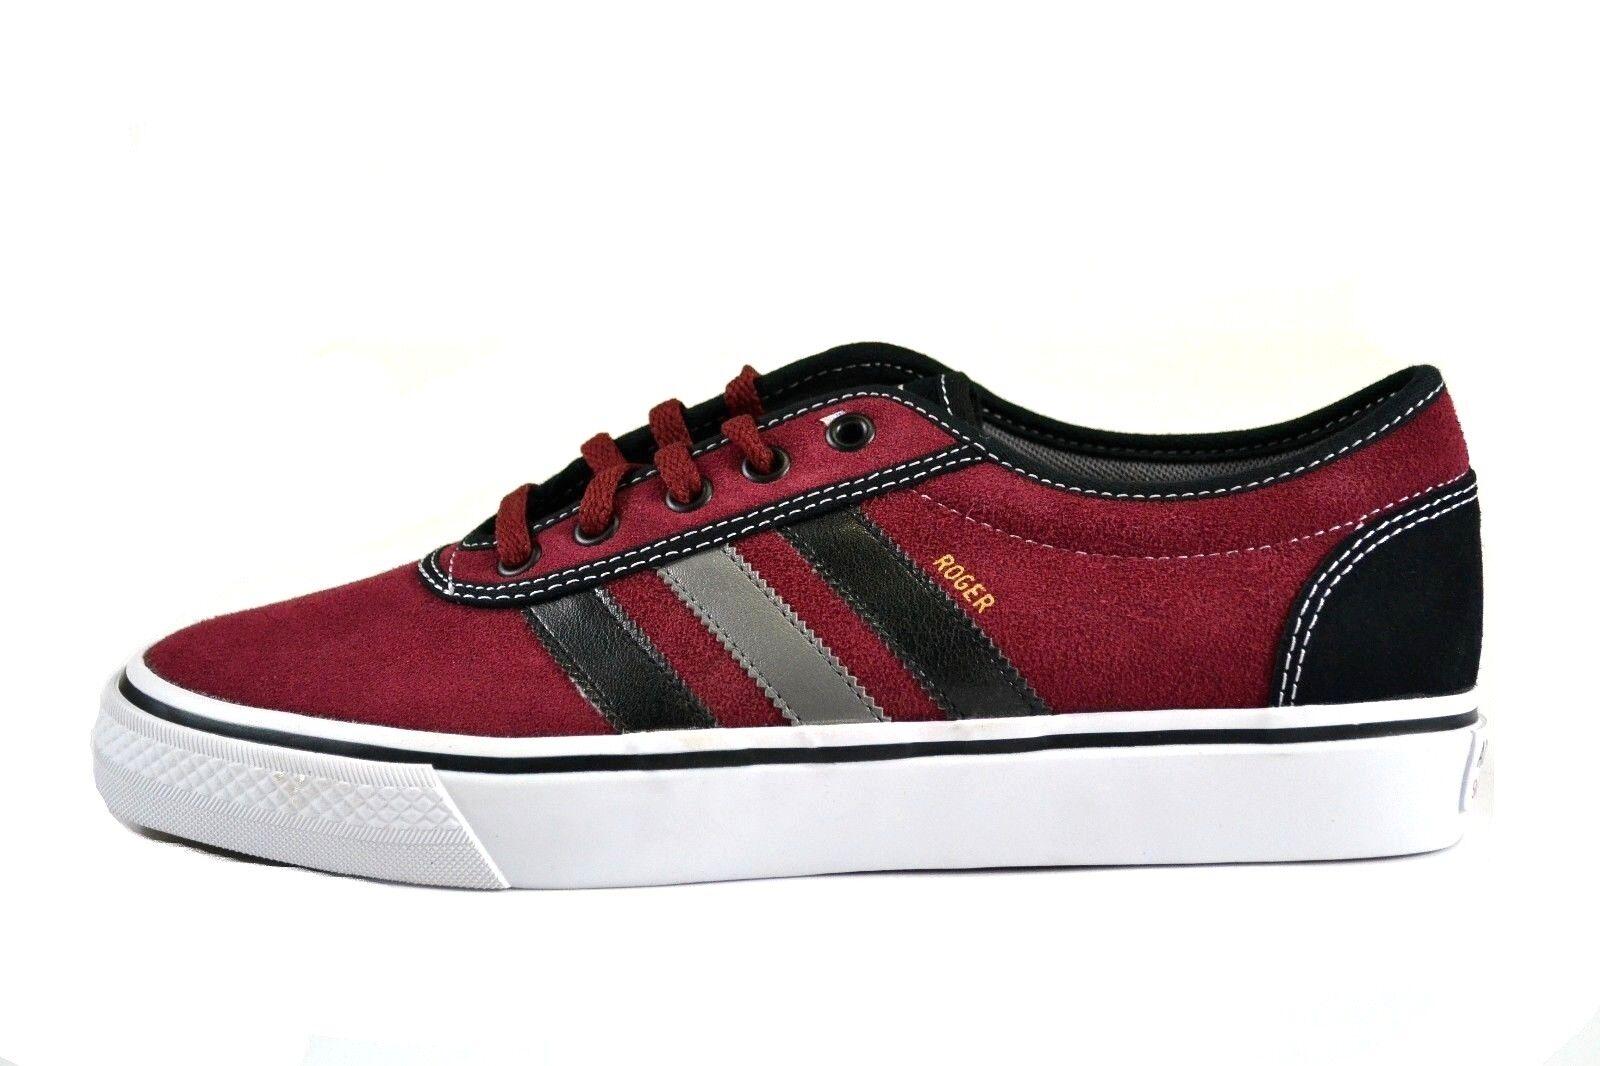 Adidas ADI EASE ROGER Red Black Gray White Suede Skateboarding (187) Men's Shoes